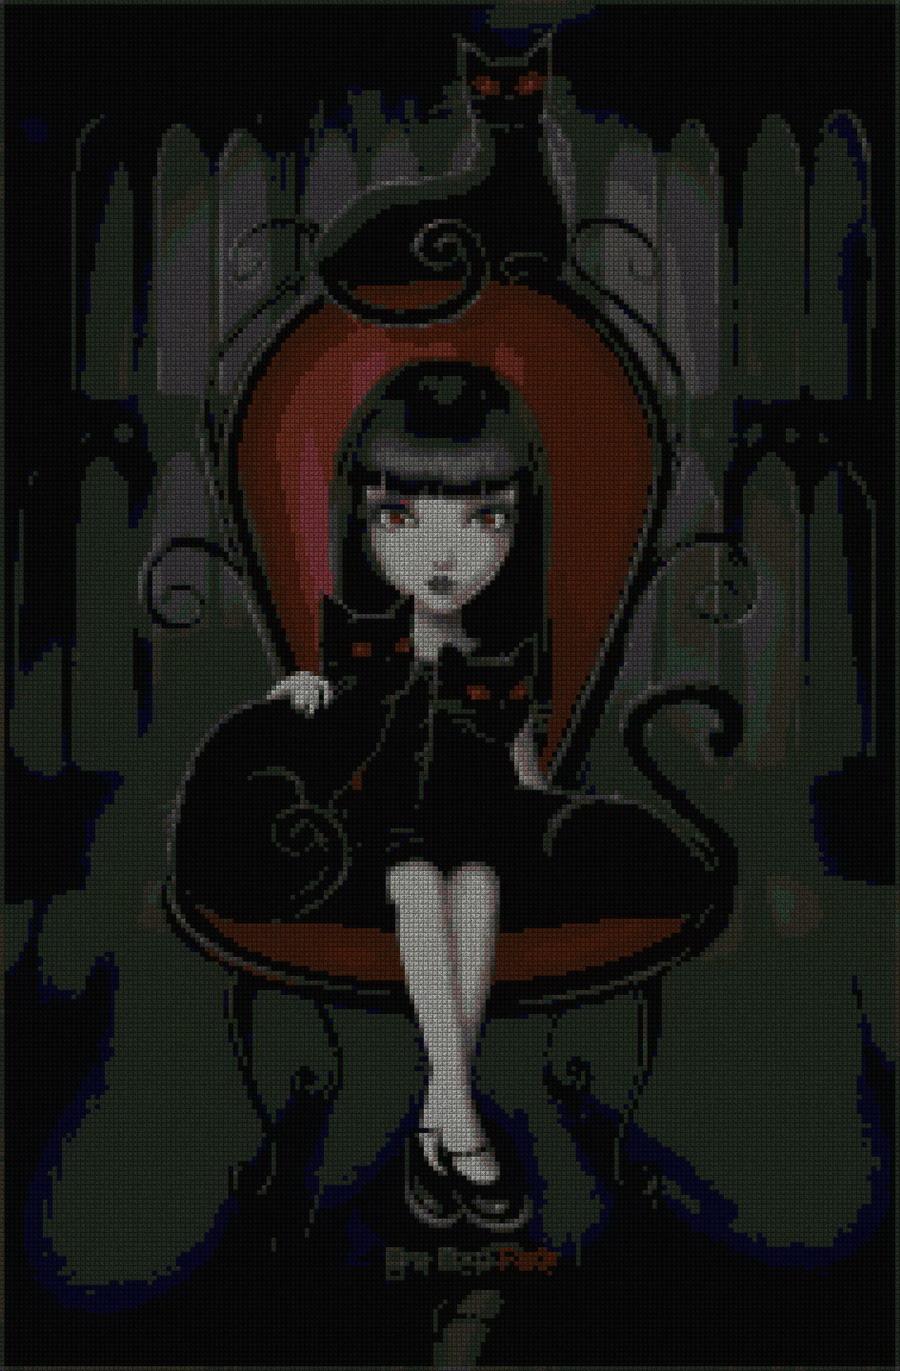 schemi_misti/misti3/Emily-Strange_189x288.jpg